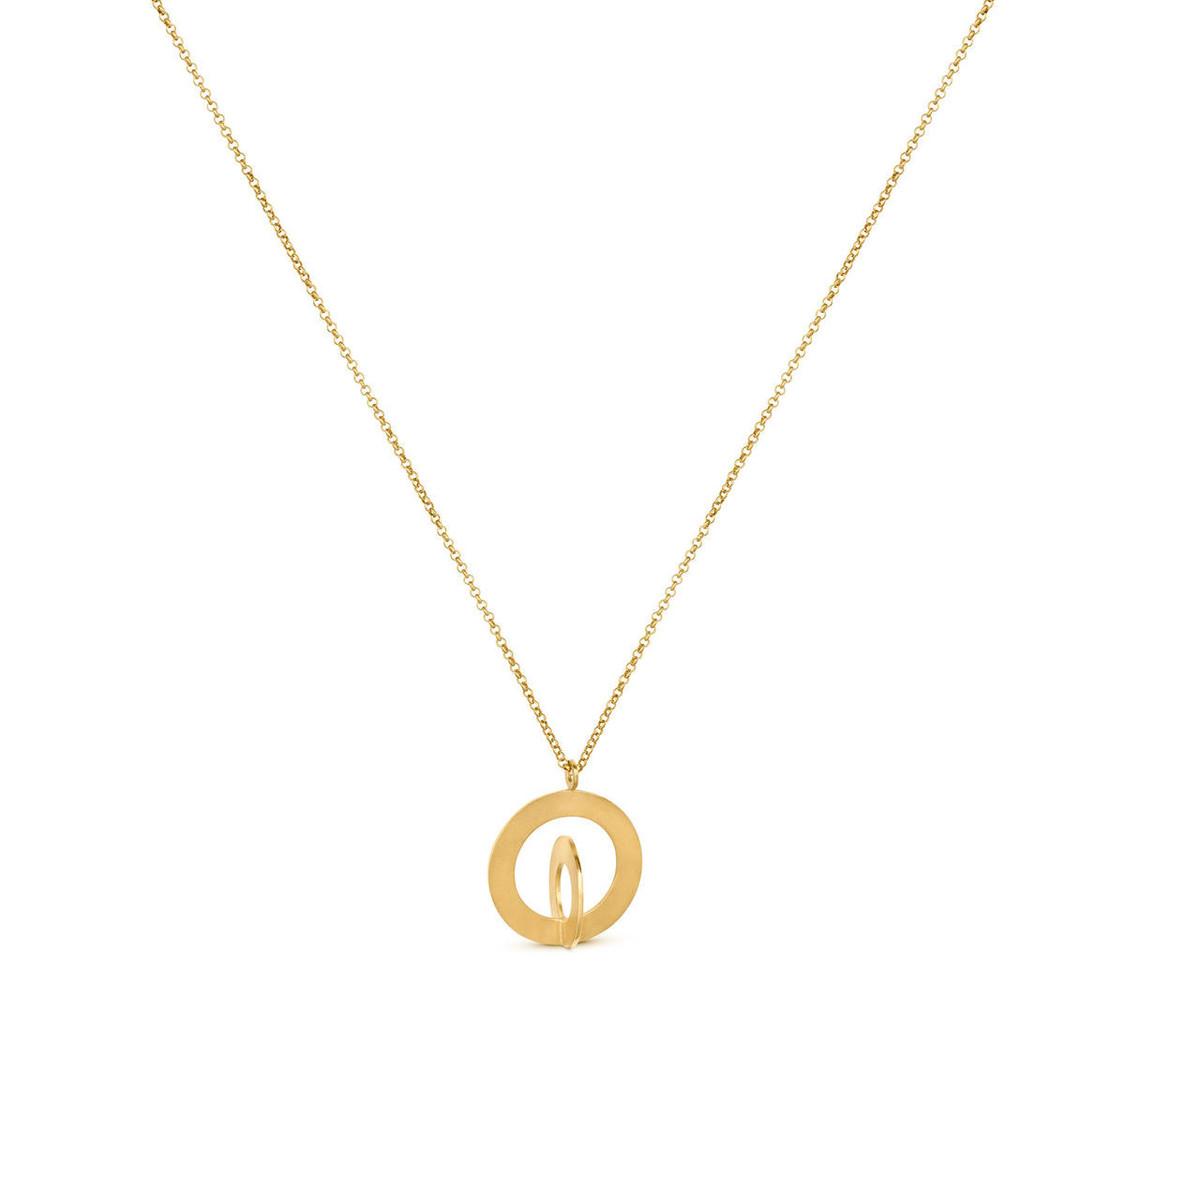 Joidart Cercles Large Gold Pendant